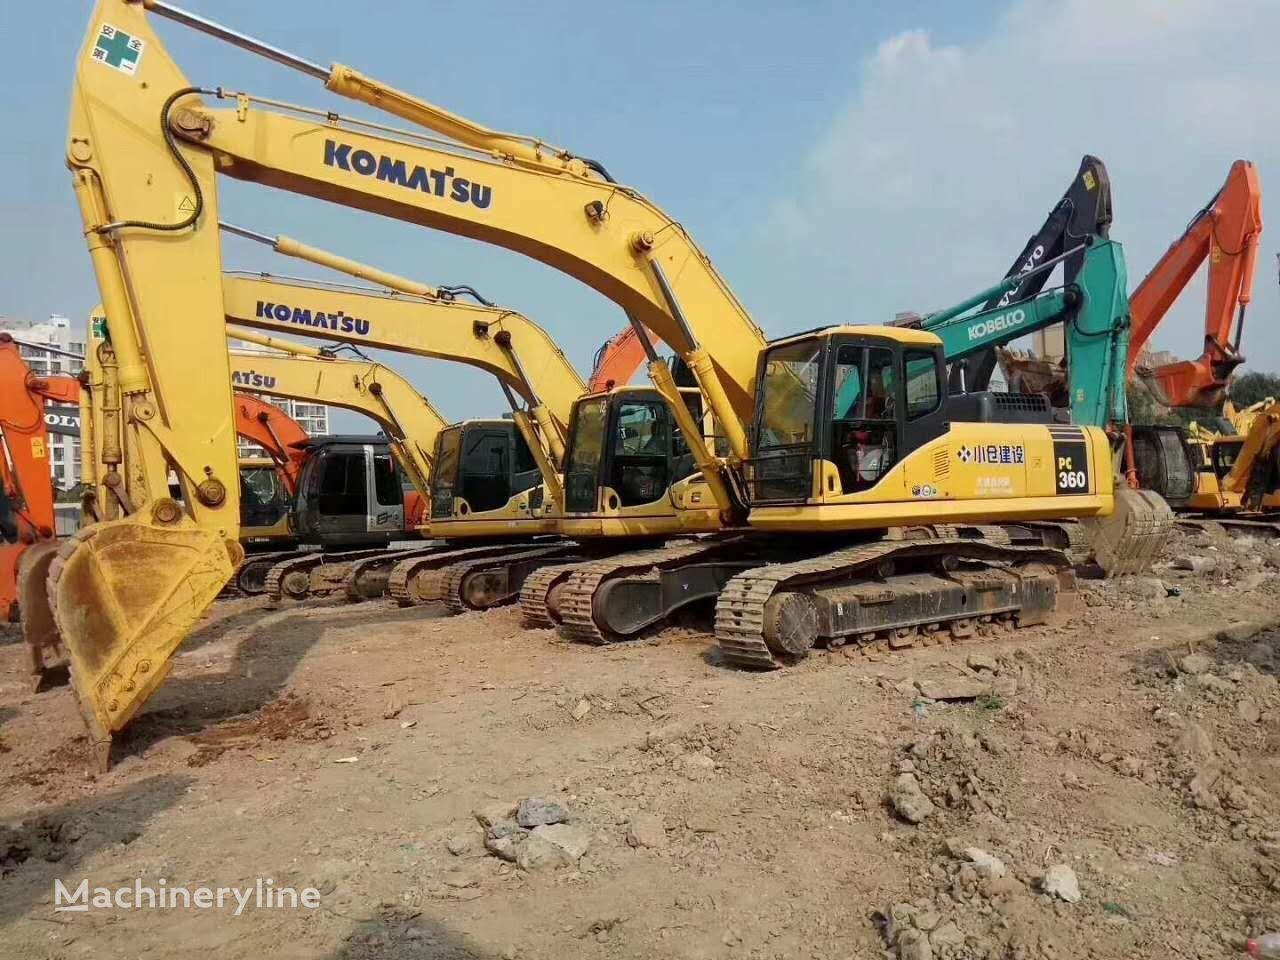 KOMATSU PC360 tracked excavator